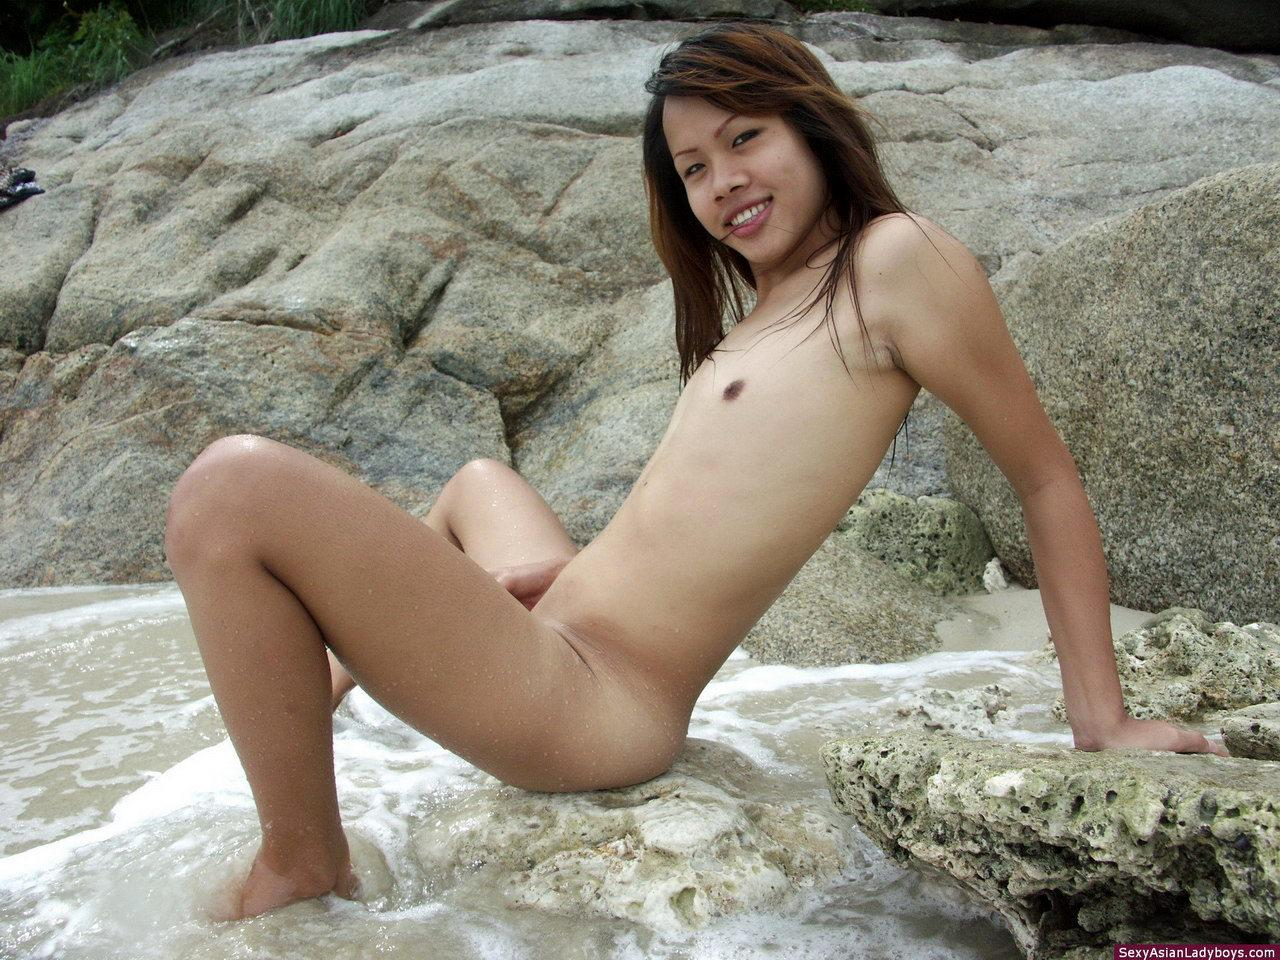 Arousing Teen Tgirl Enjoys Self Abuse Of Her Ass-Hole